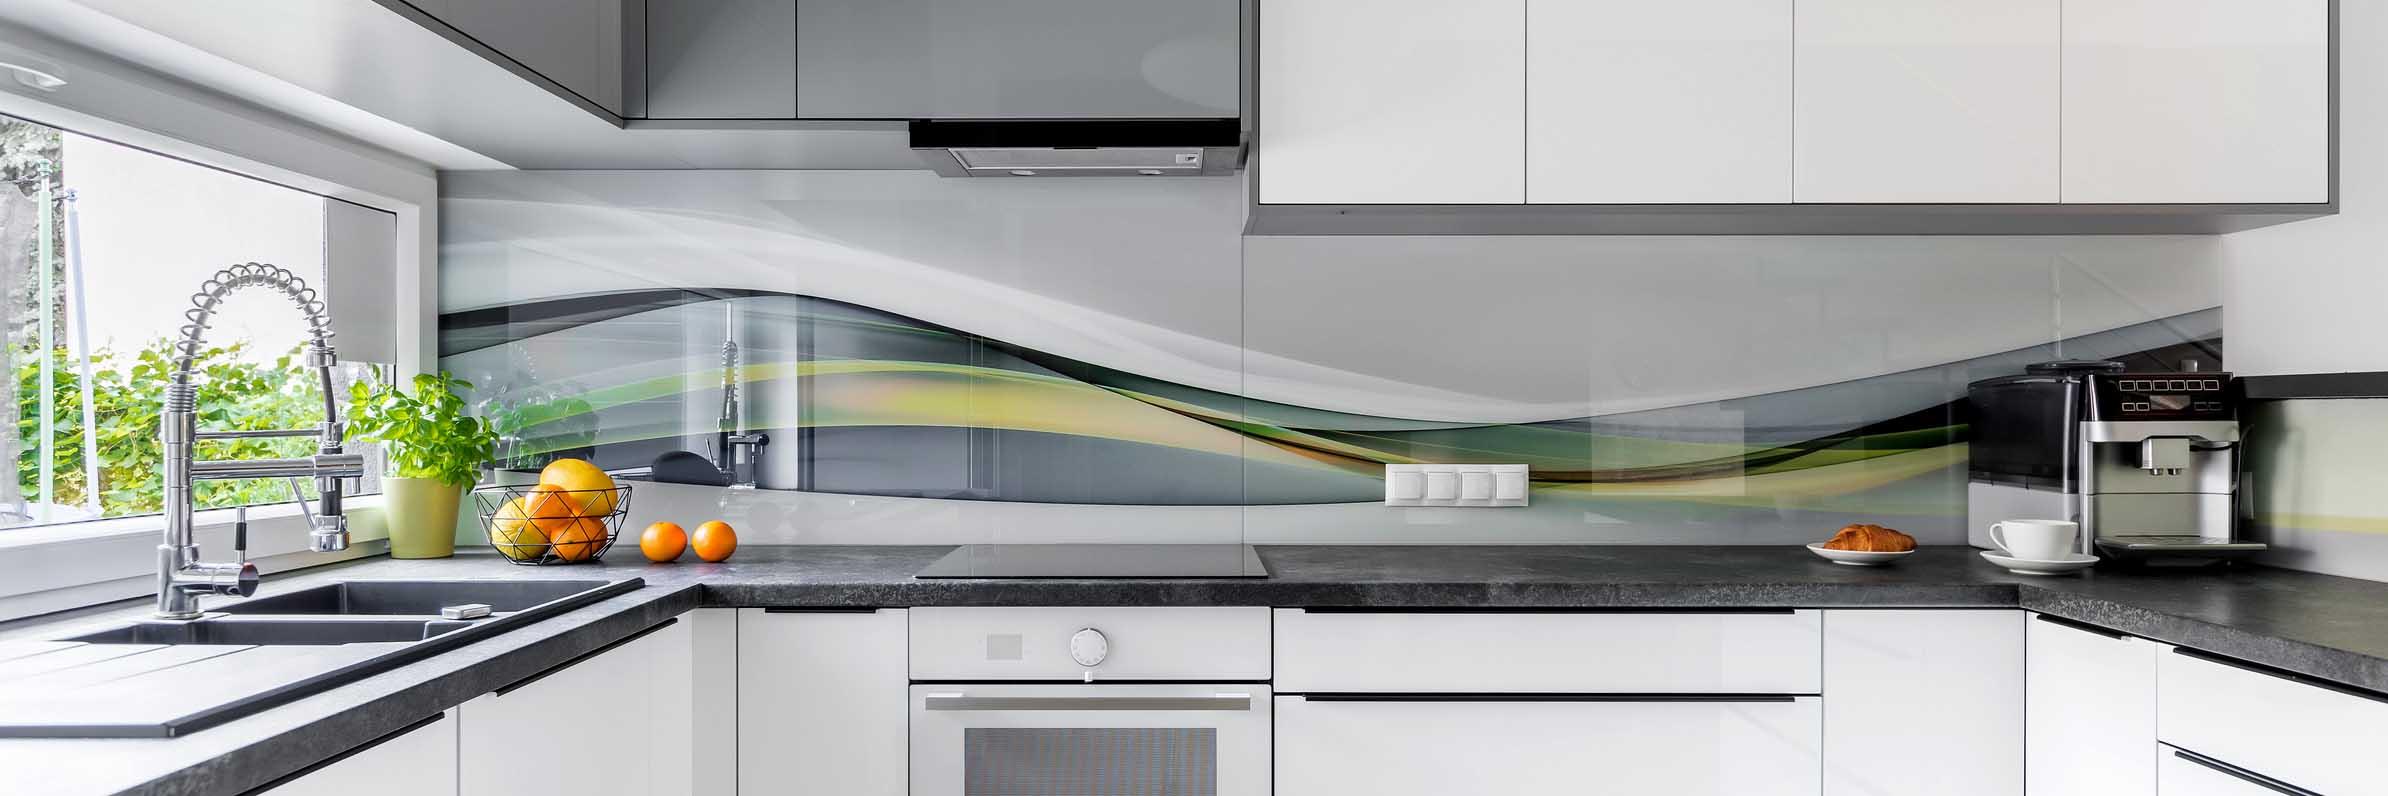 panele szklane do kuchni i azienki z monta em wroc aw. Black Bedroom Furniture Sets. Home Design Ideas